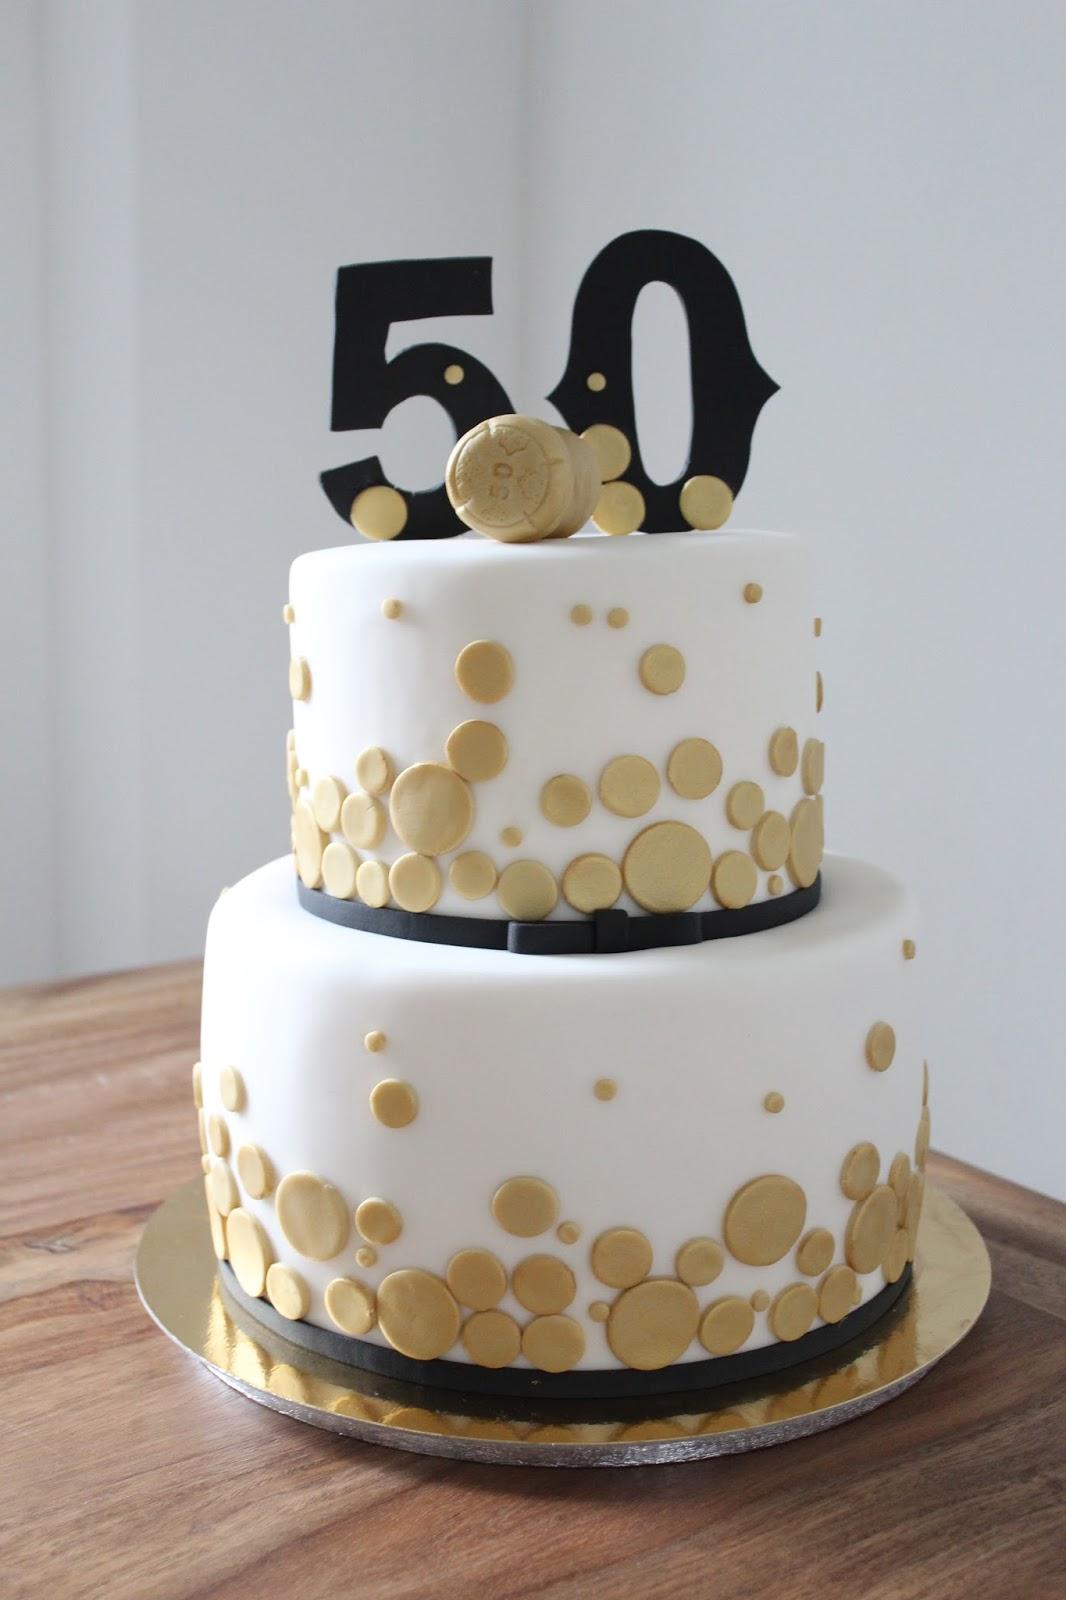 Kuchen Fur 50 Geburtstag Hylen Maddawards Com